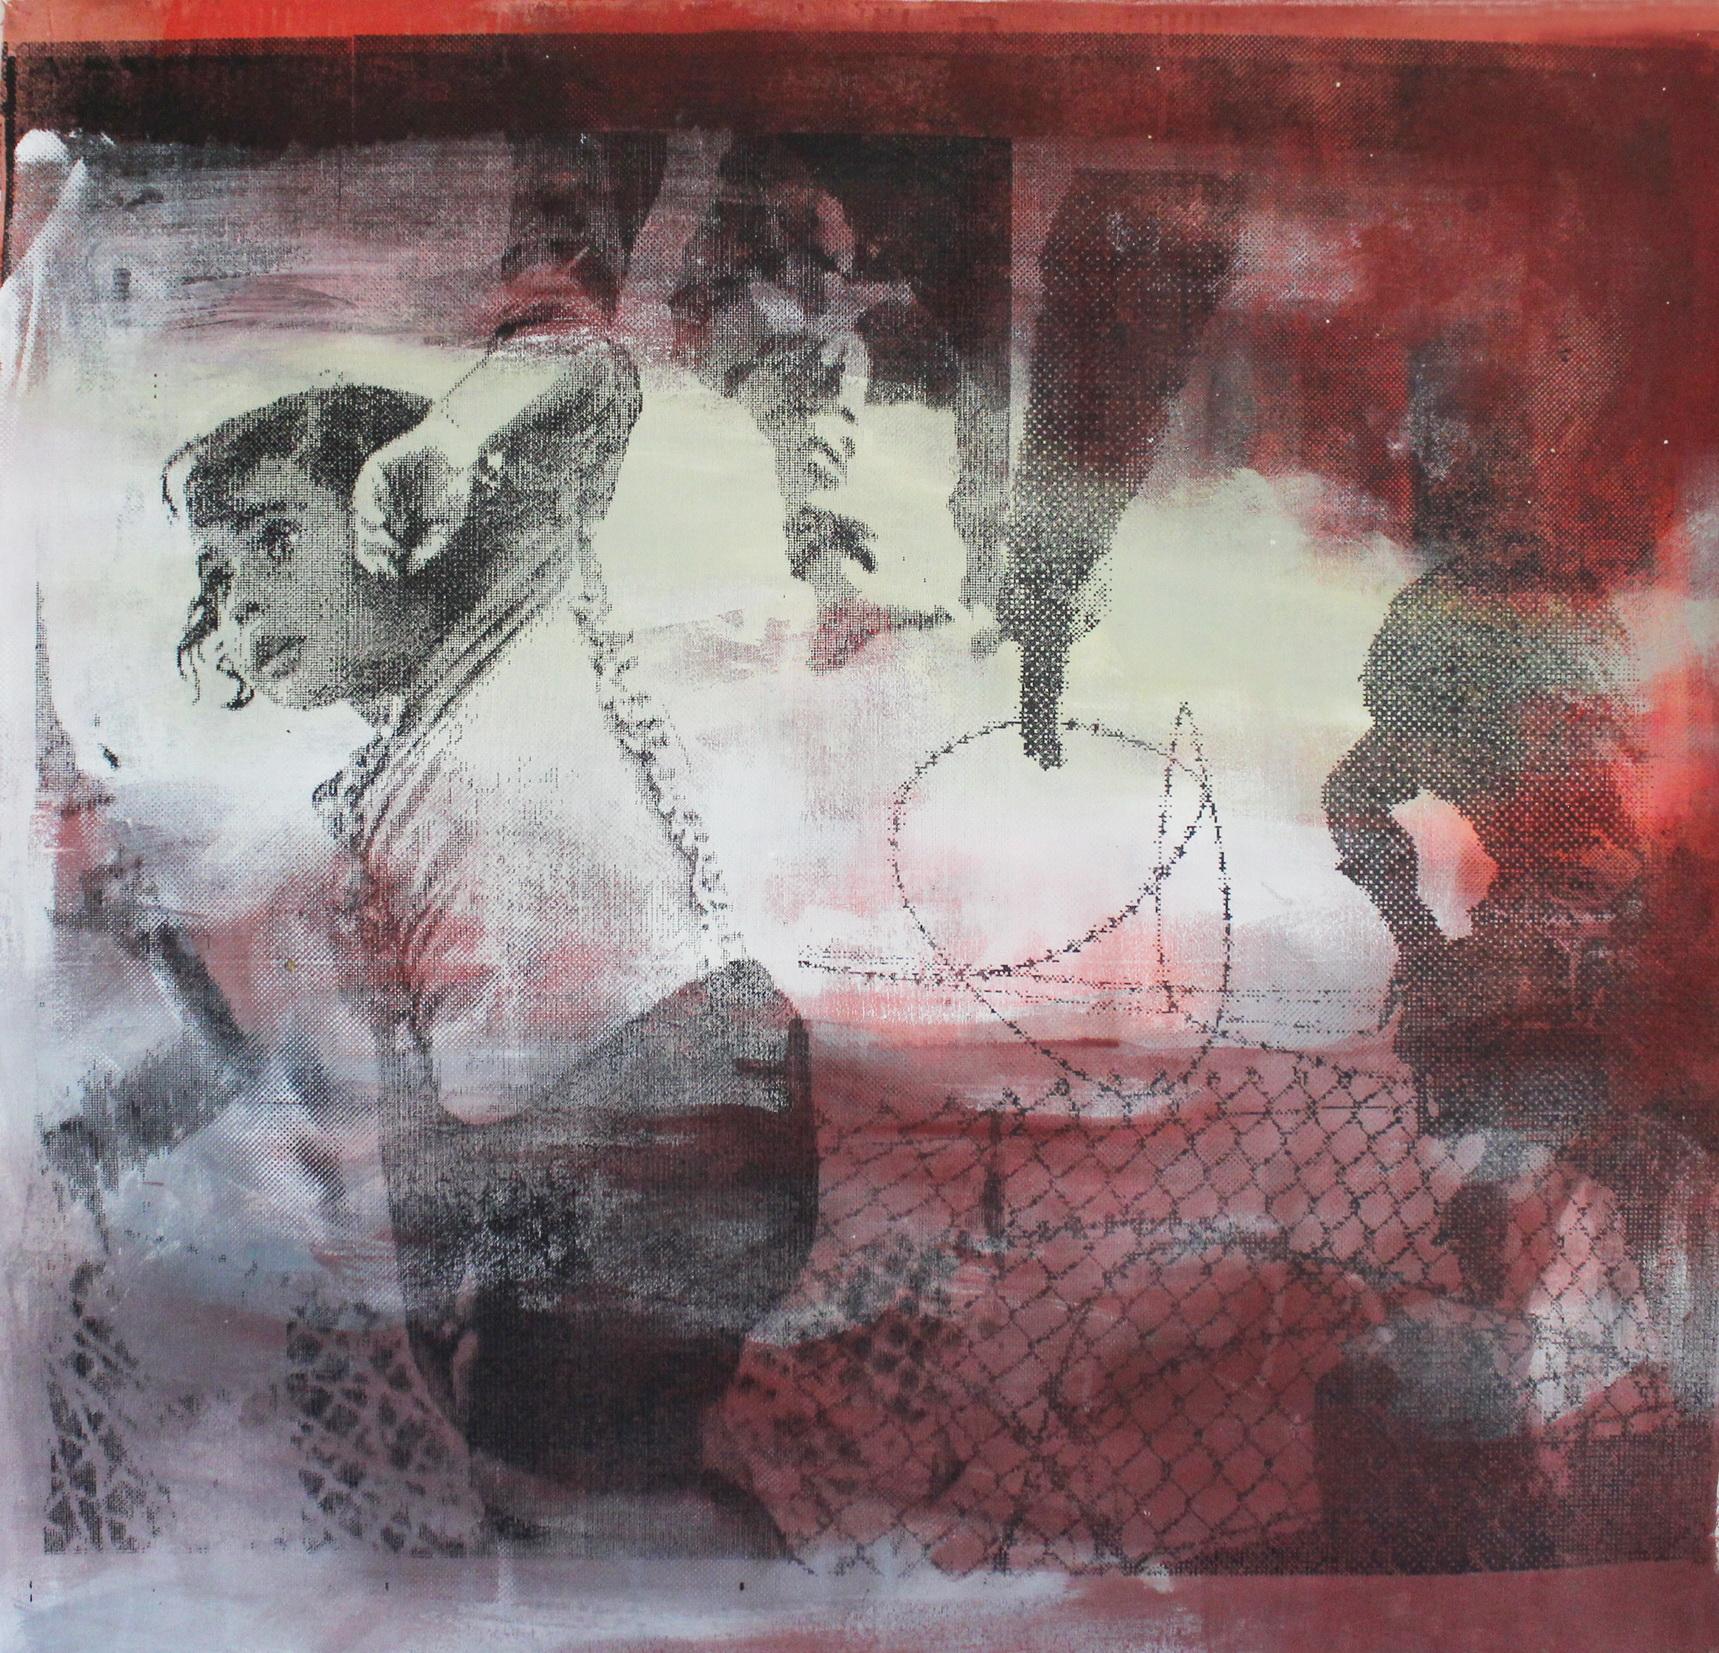 Sibylle Möndel | Grenzland #201518 | Acryl, Siebdruck auf Leinwand